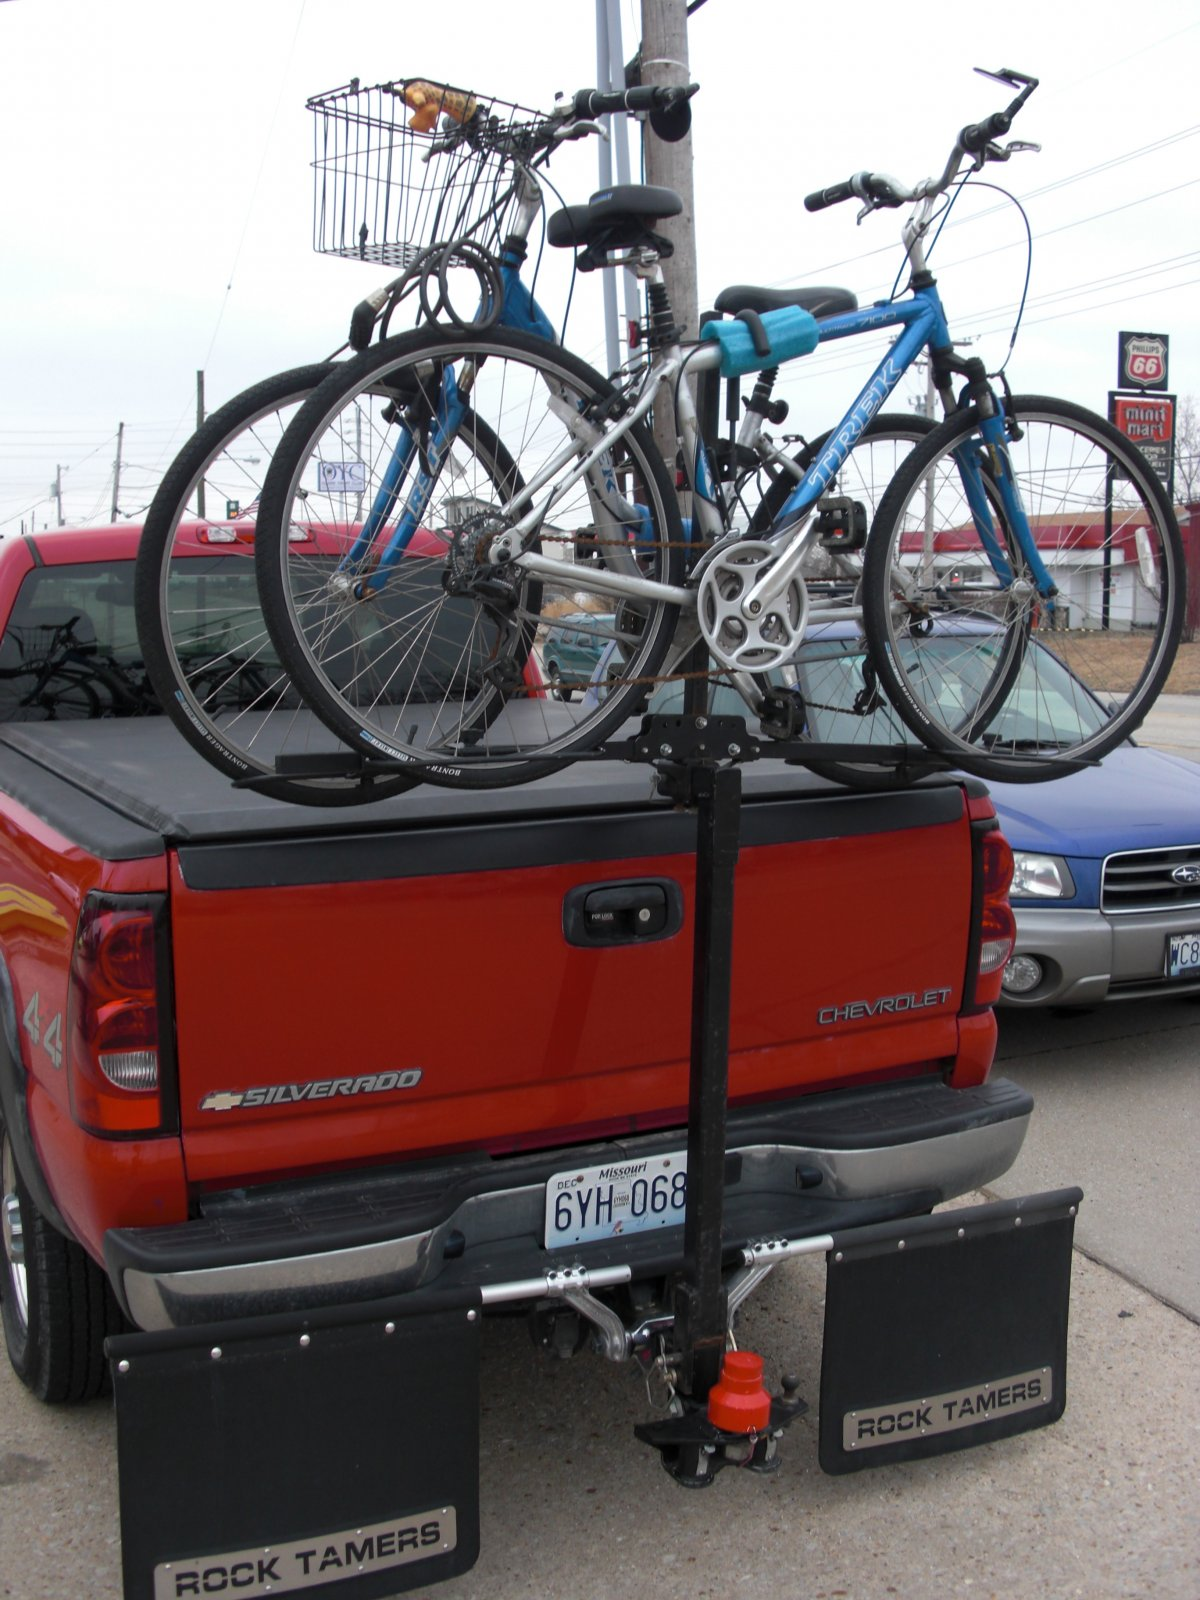 Click image for larger version  Name:Bike Rack.jpg Views:67 Size:288.2 KB ID:97260